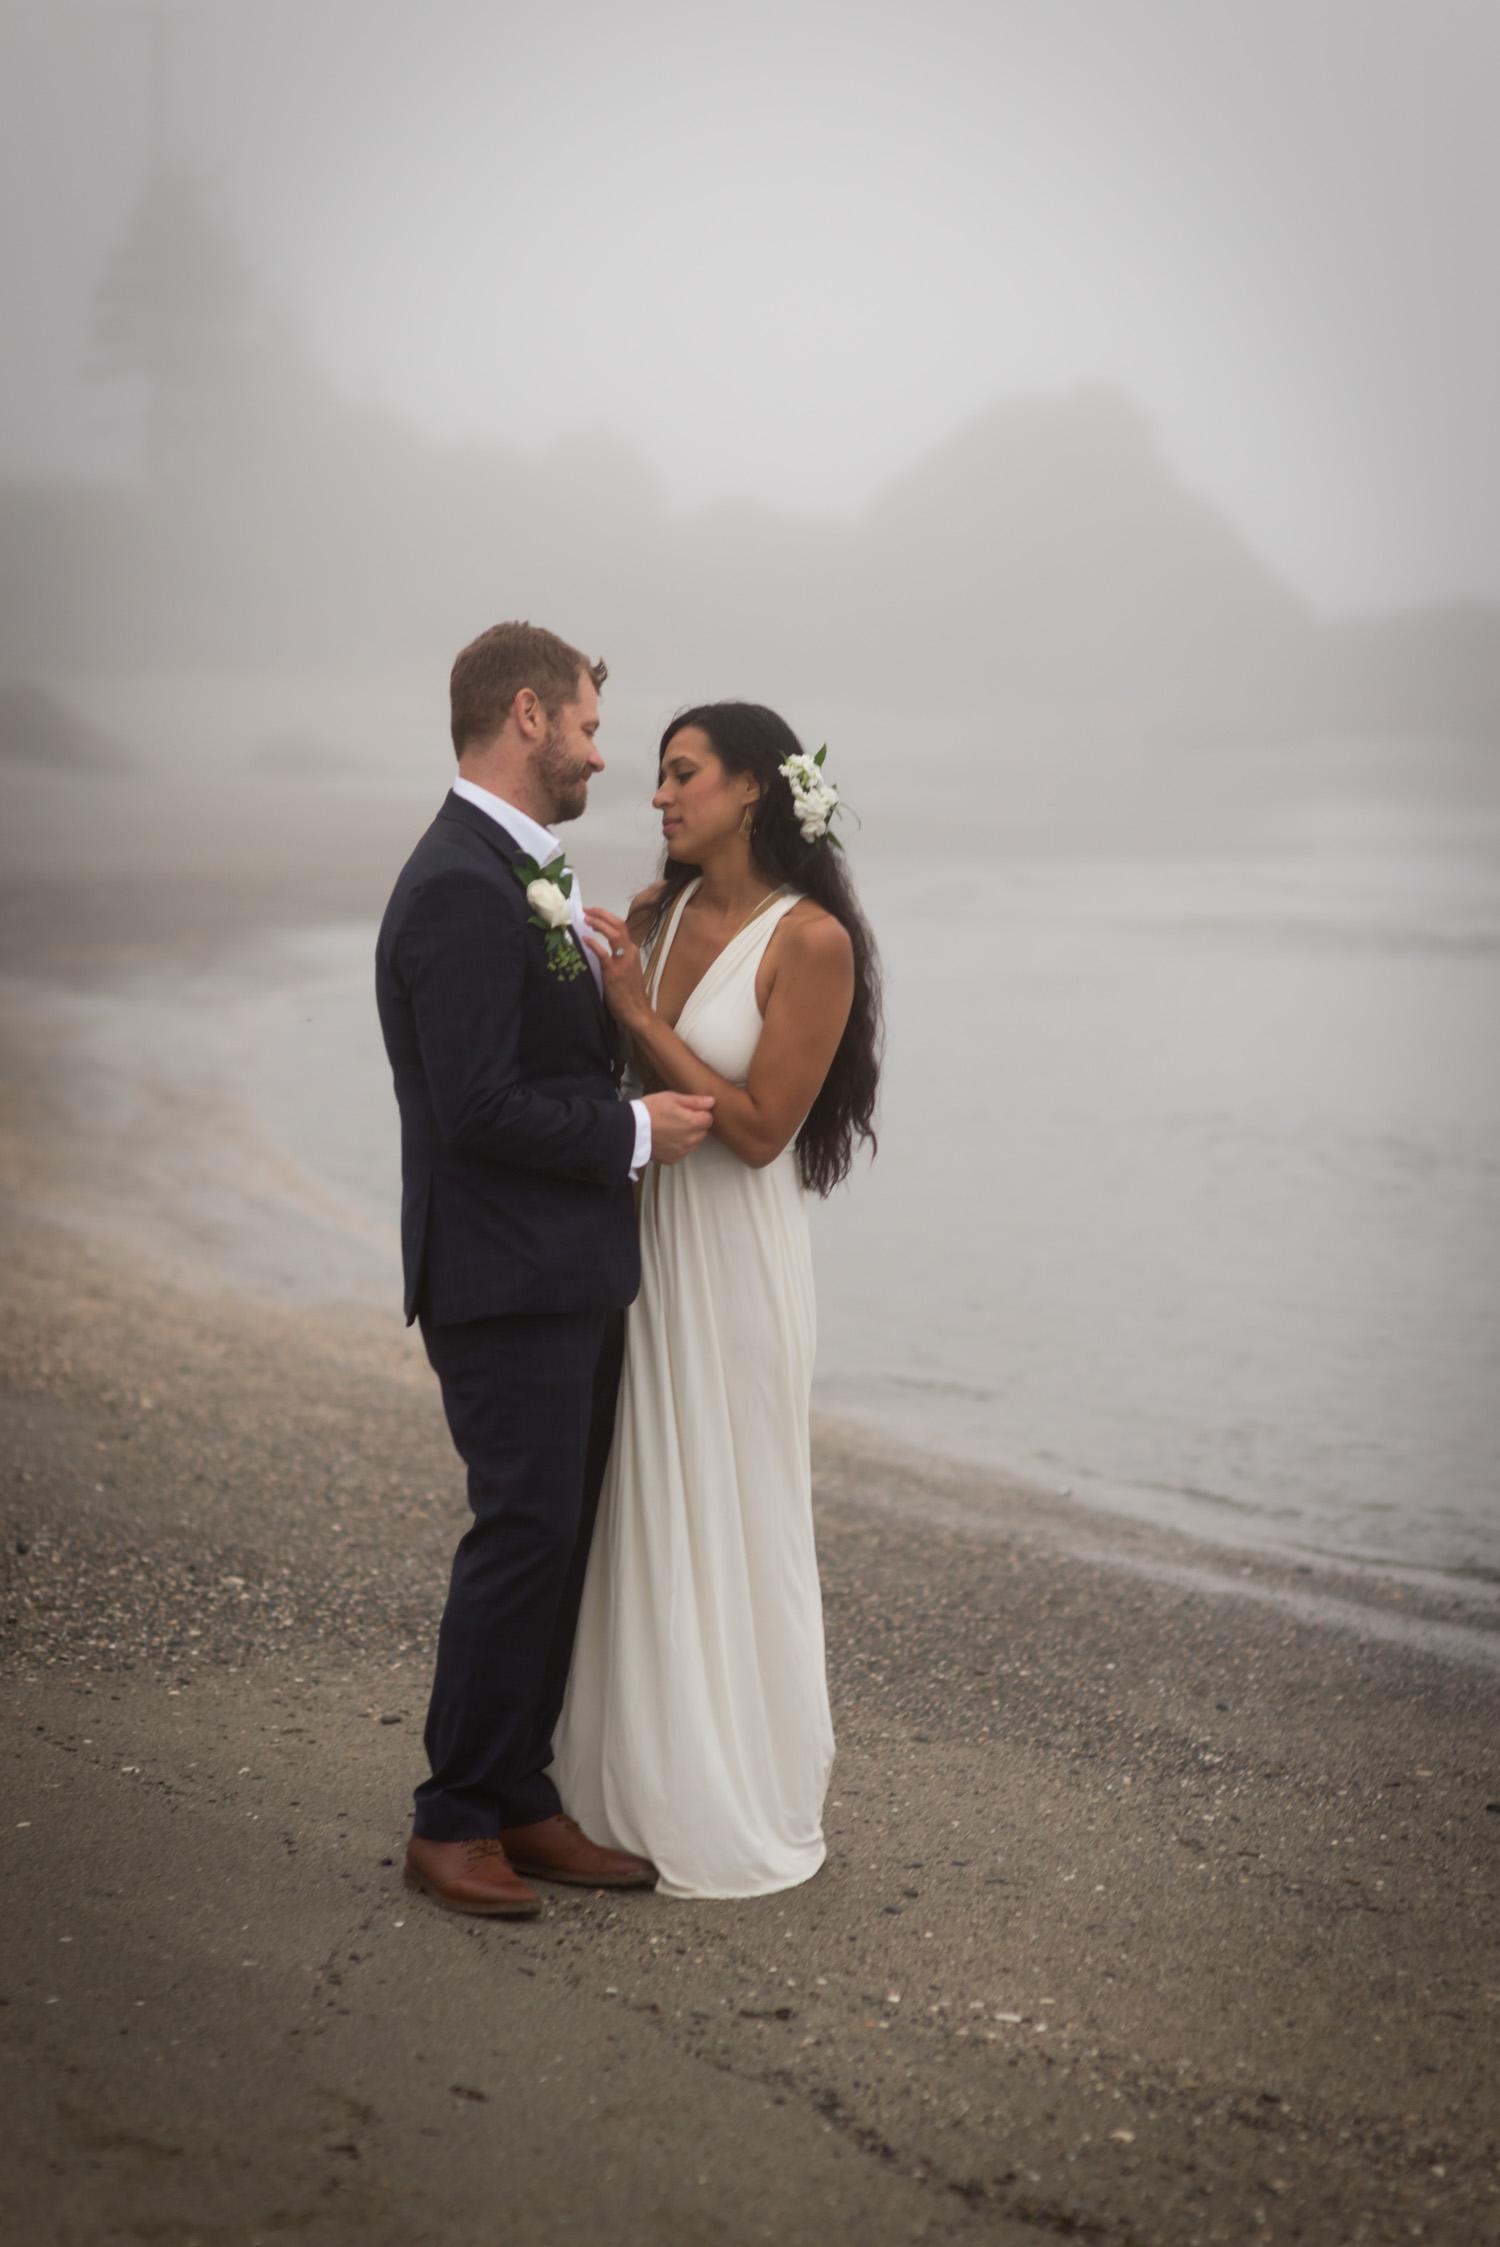 Mystical bohemian elopement in the PNW fog